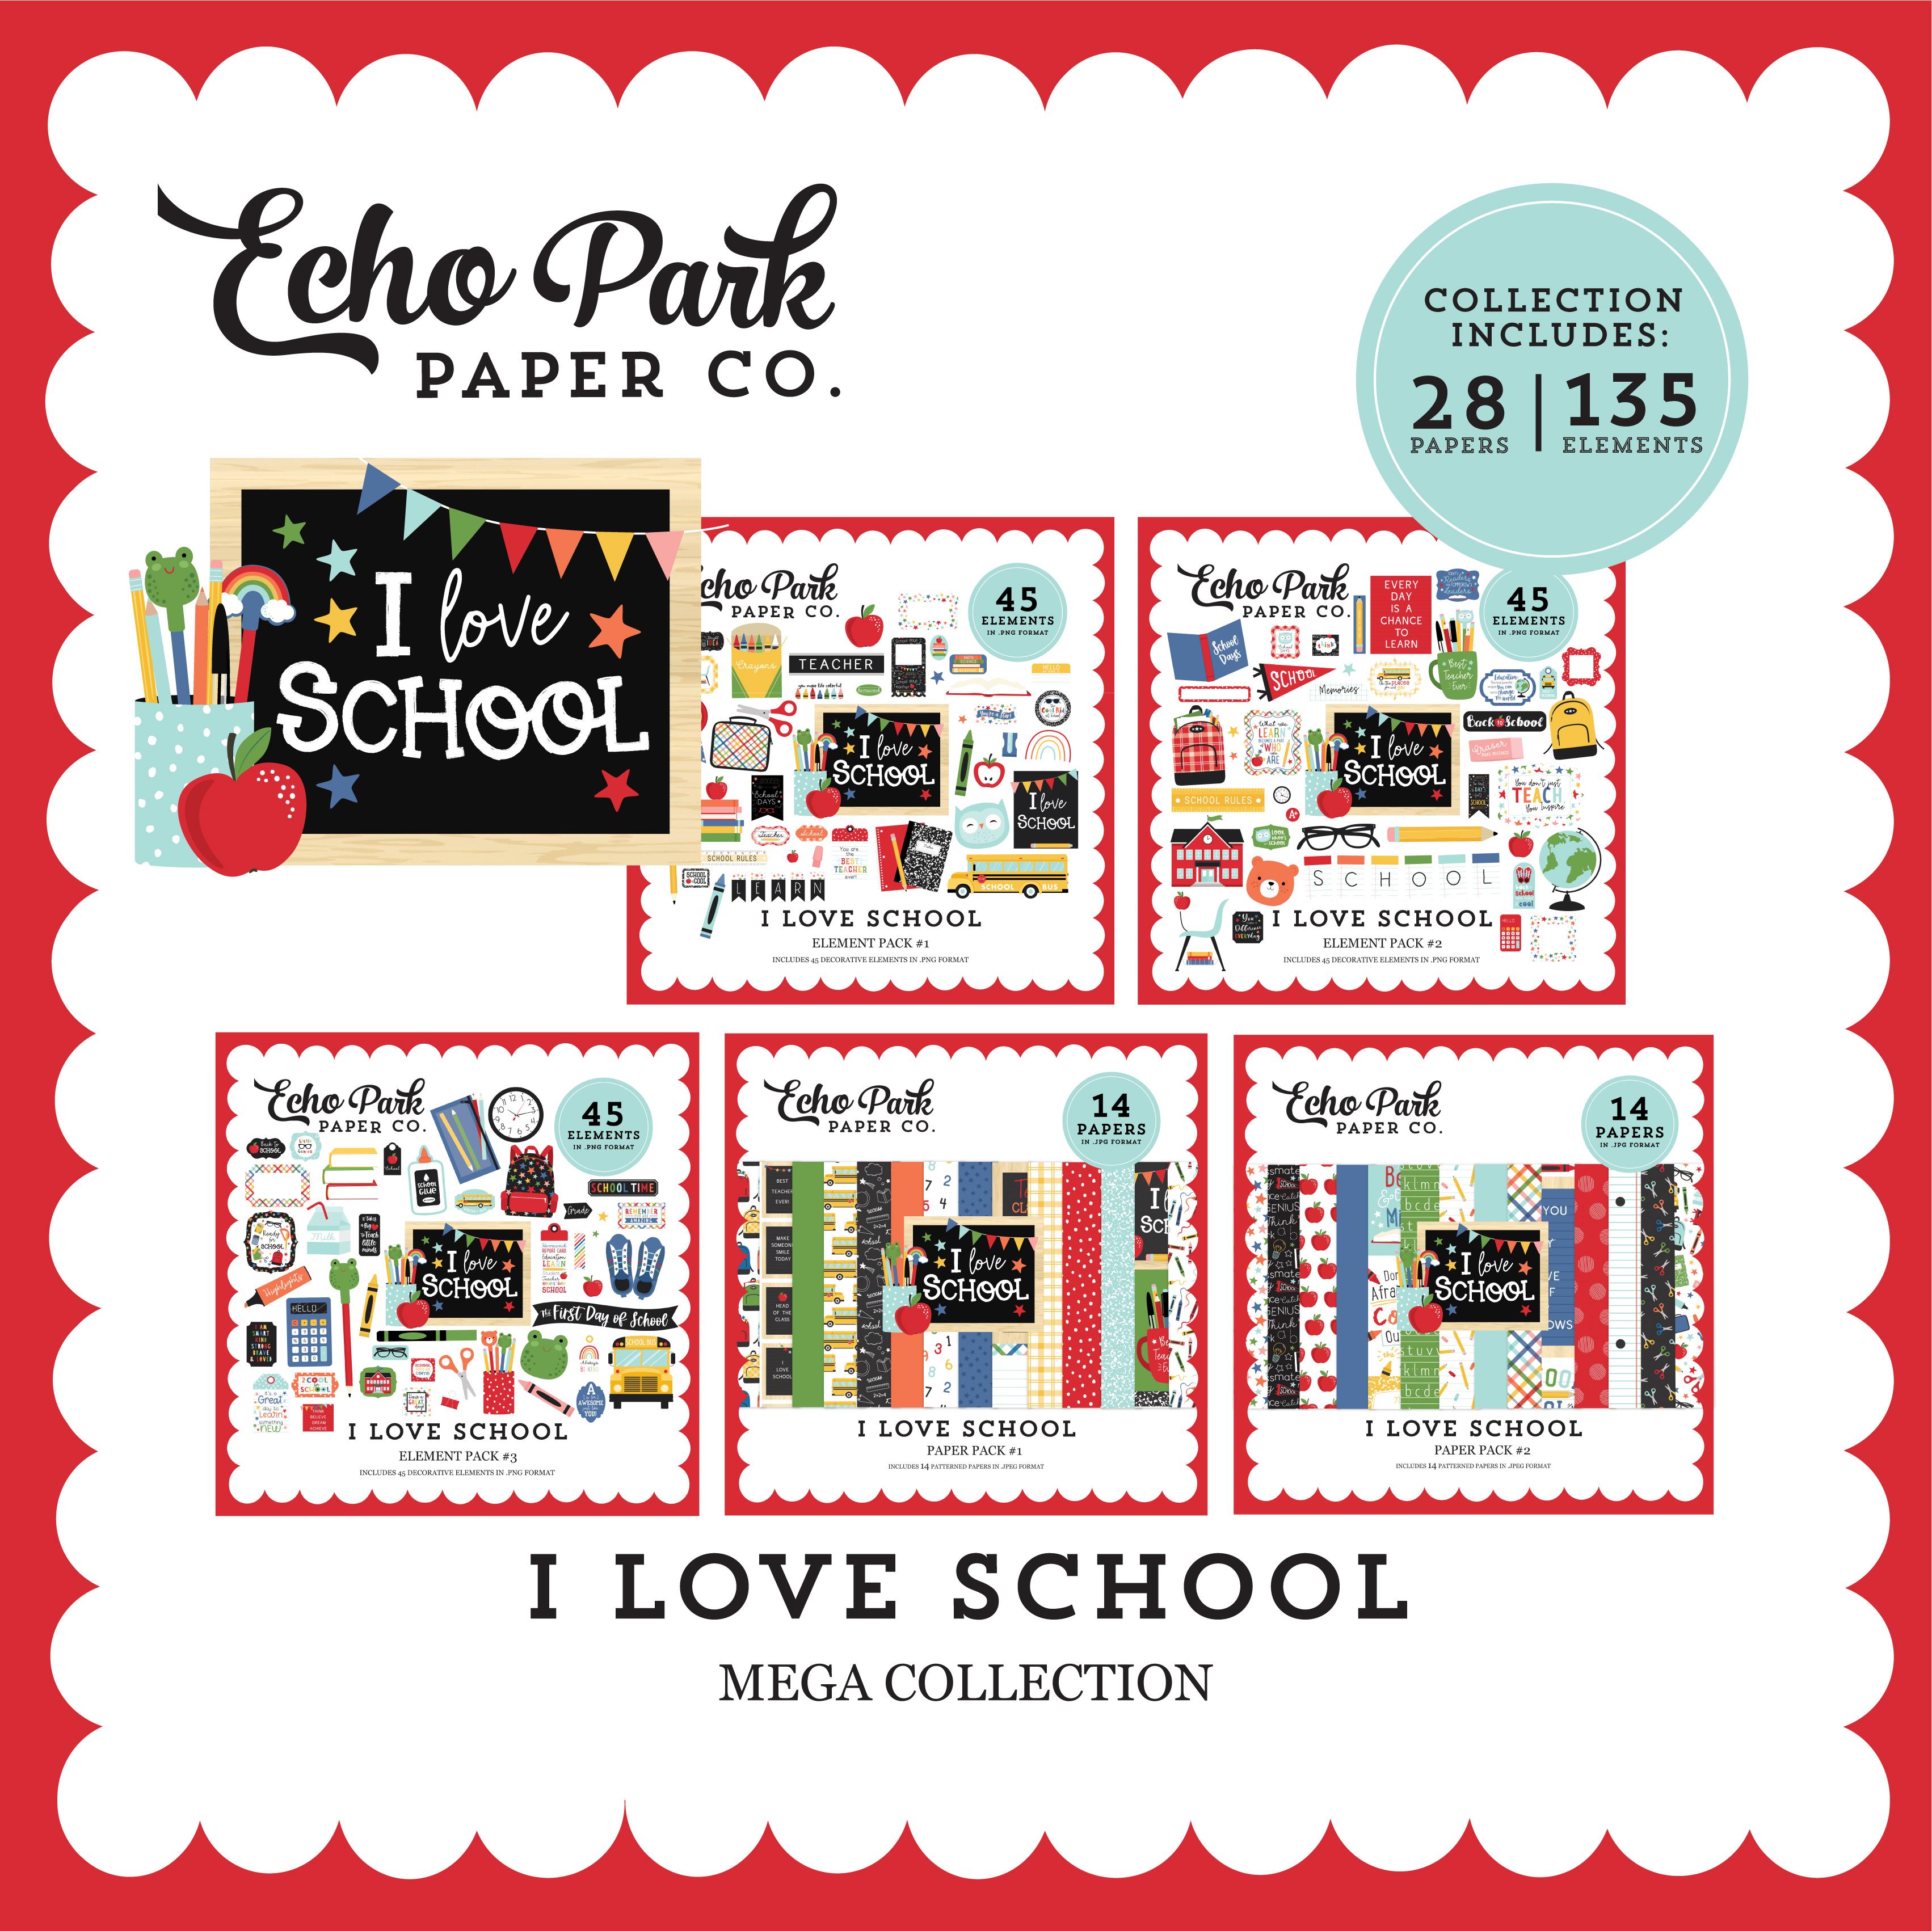 I Love School Mega Collection